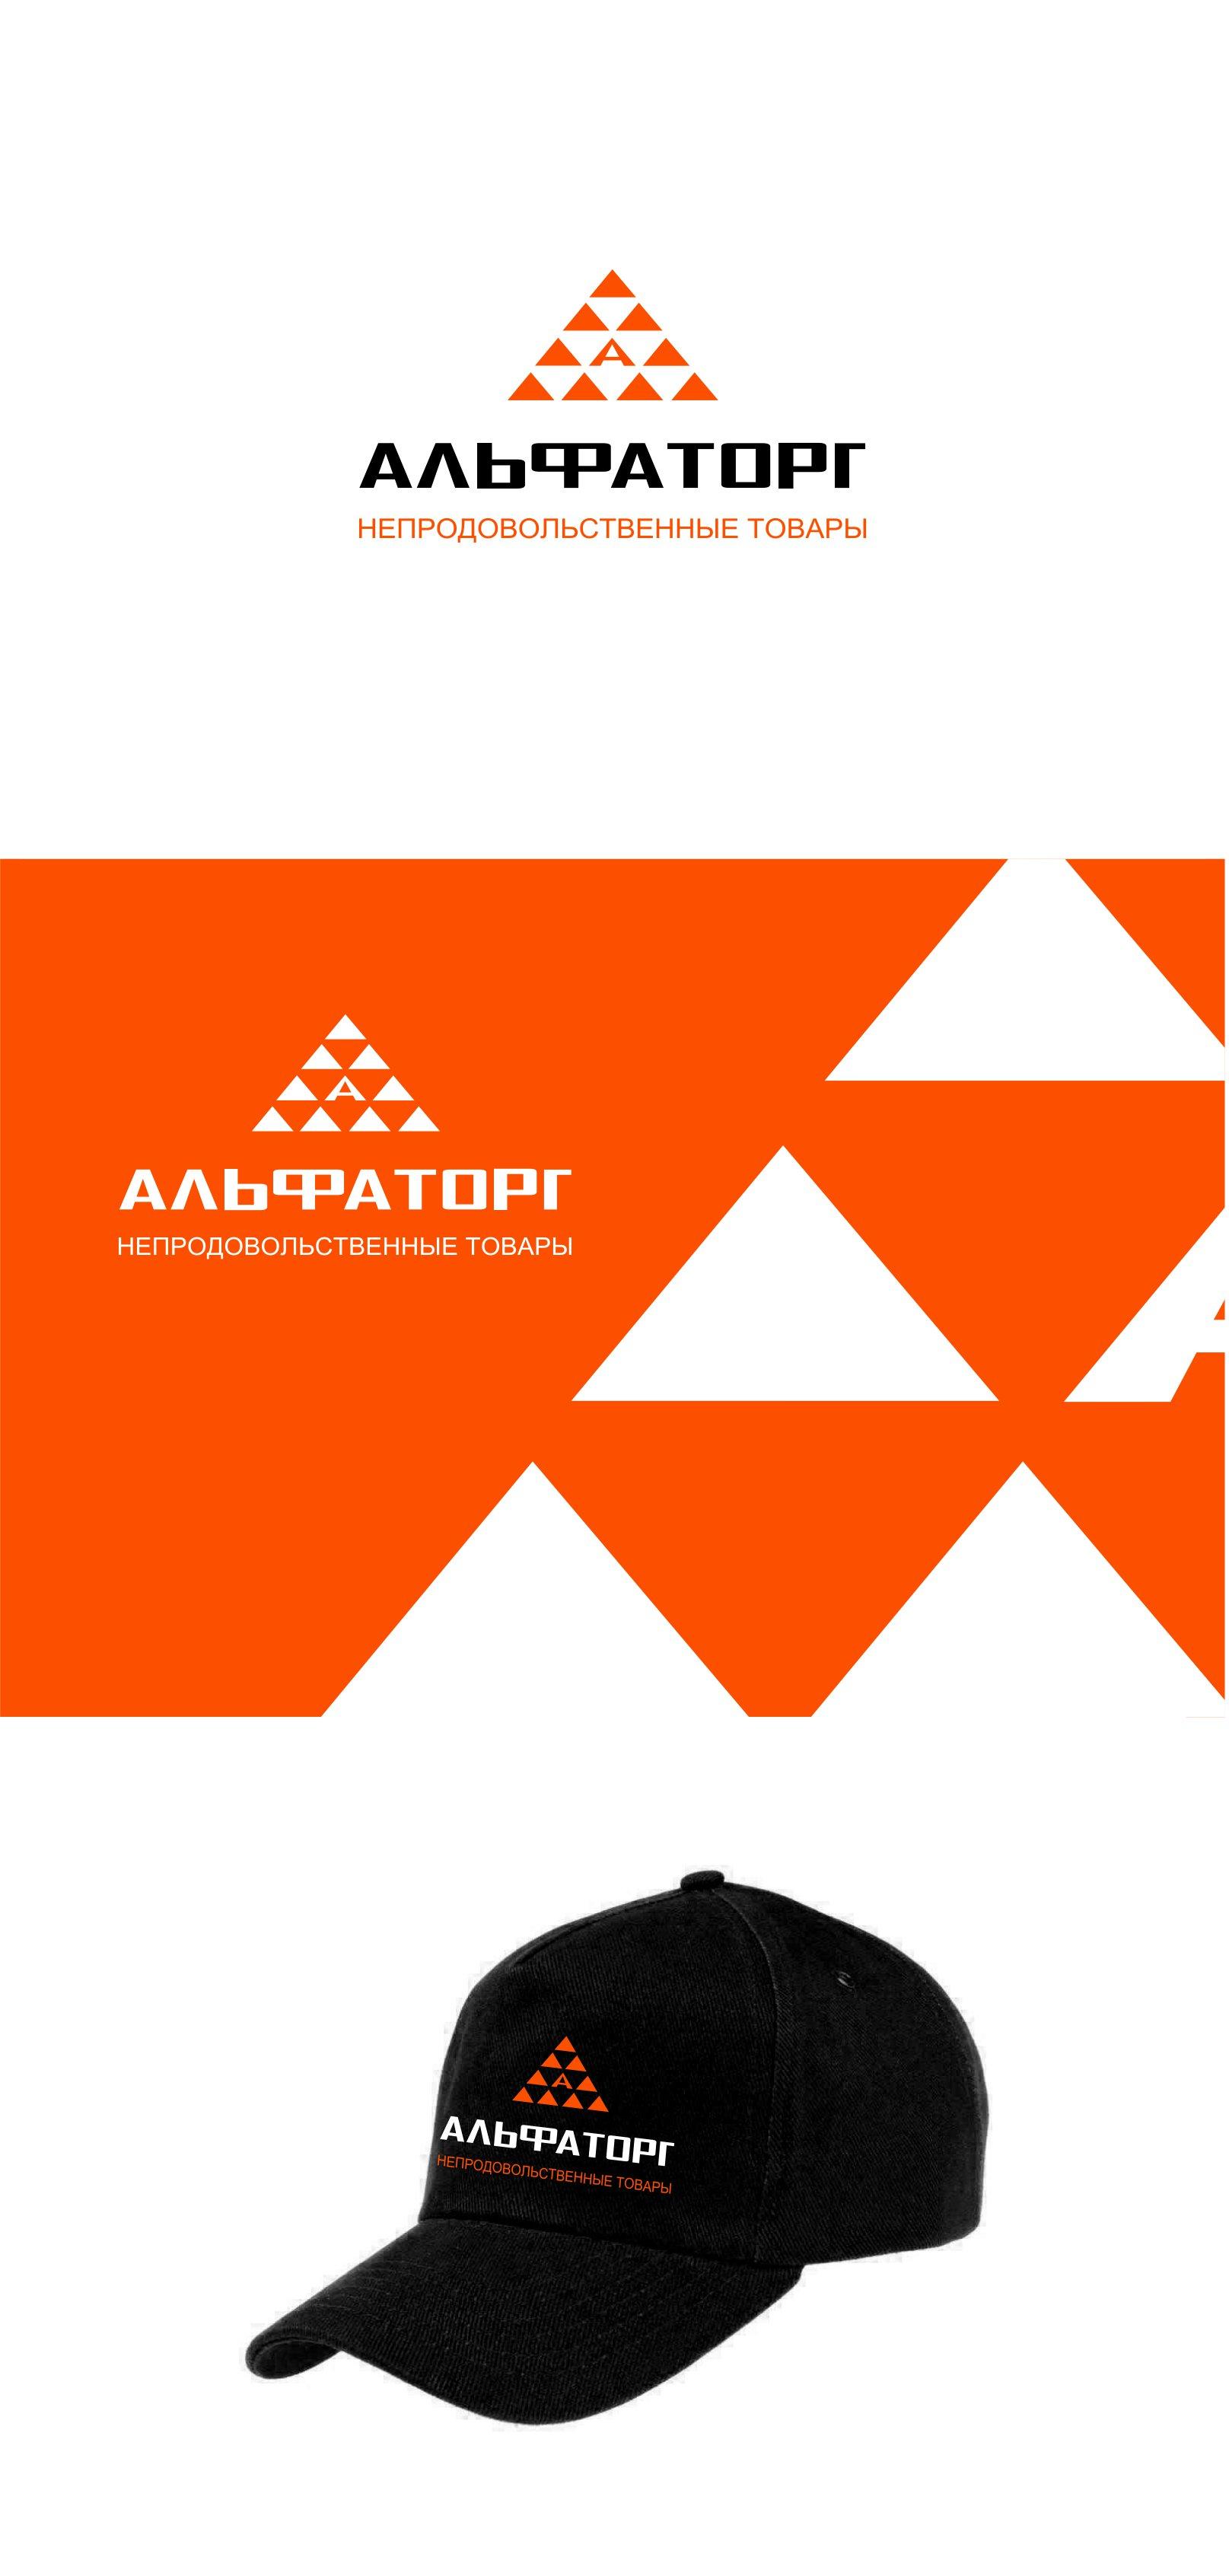 Логотип и фирменный стиль фото f_9685f0b6465930f7.jpg